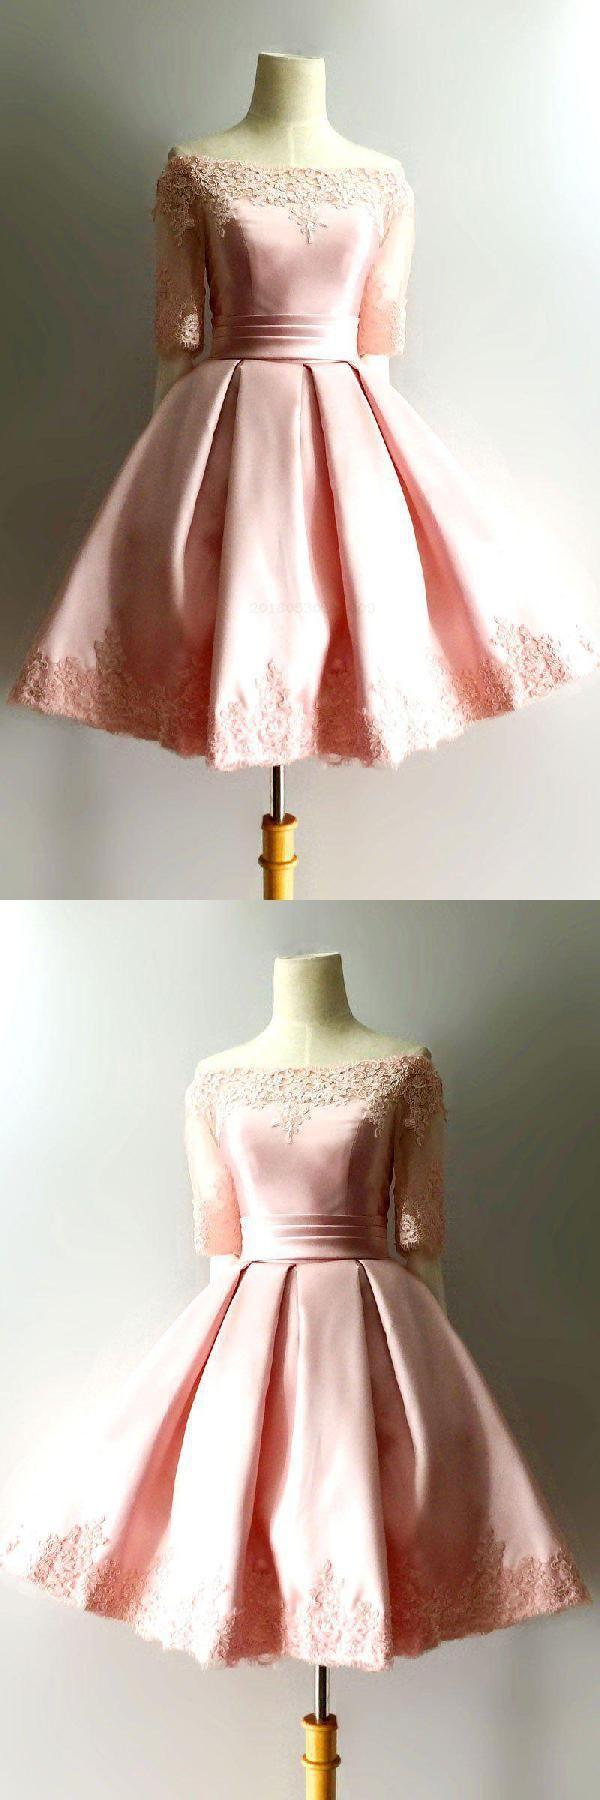 Lace prom dresses short prom dresses prom dresses pink